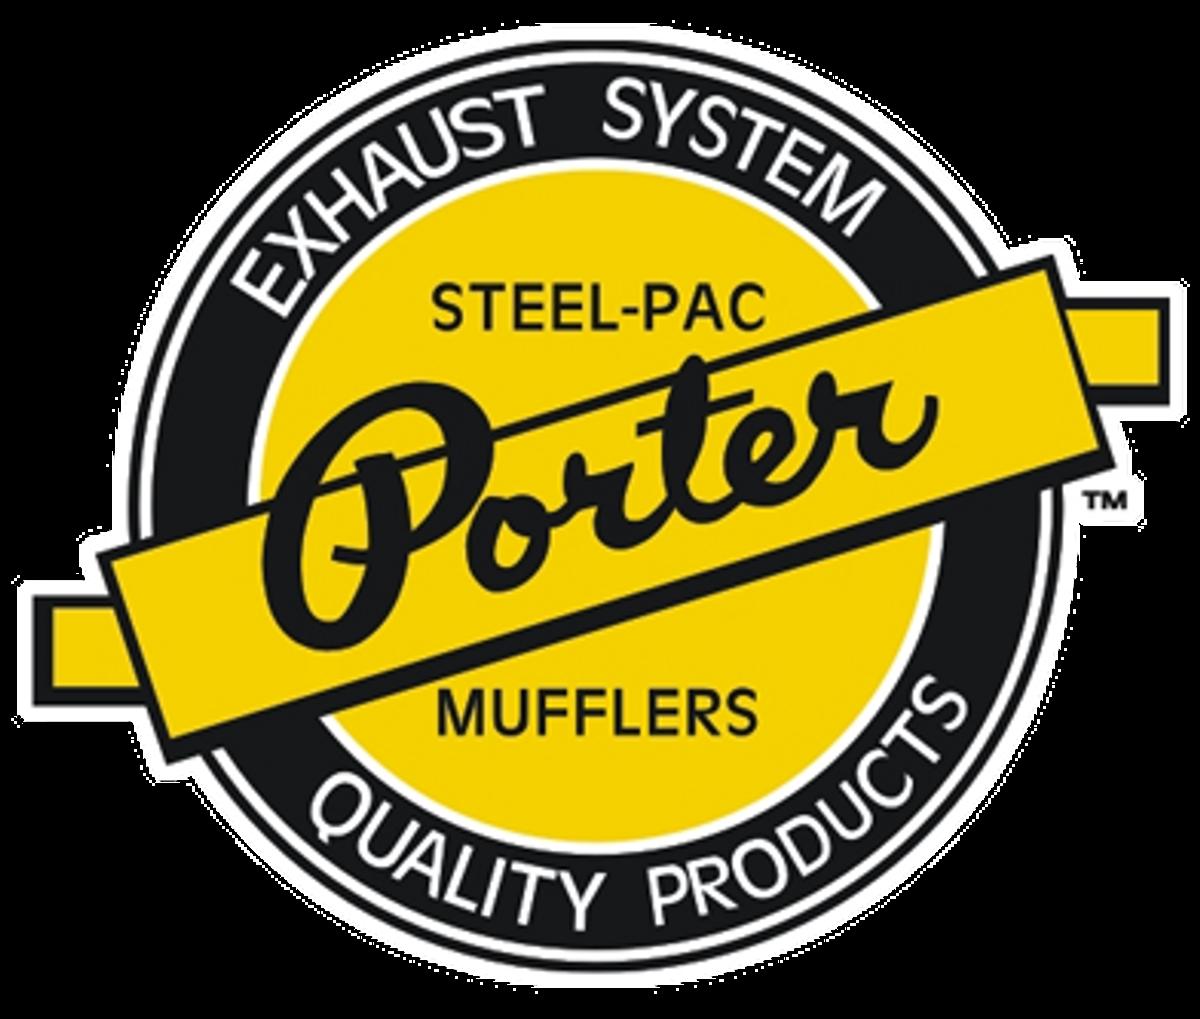 Porter Steel-Pac Mufflers